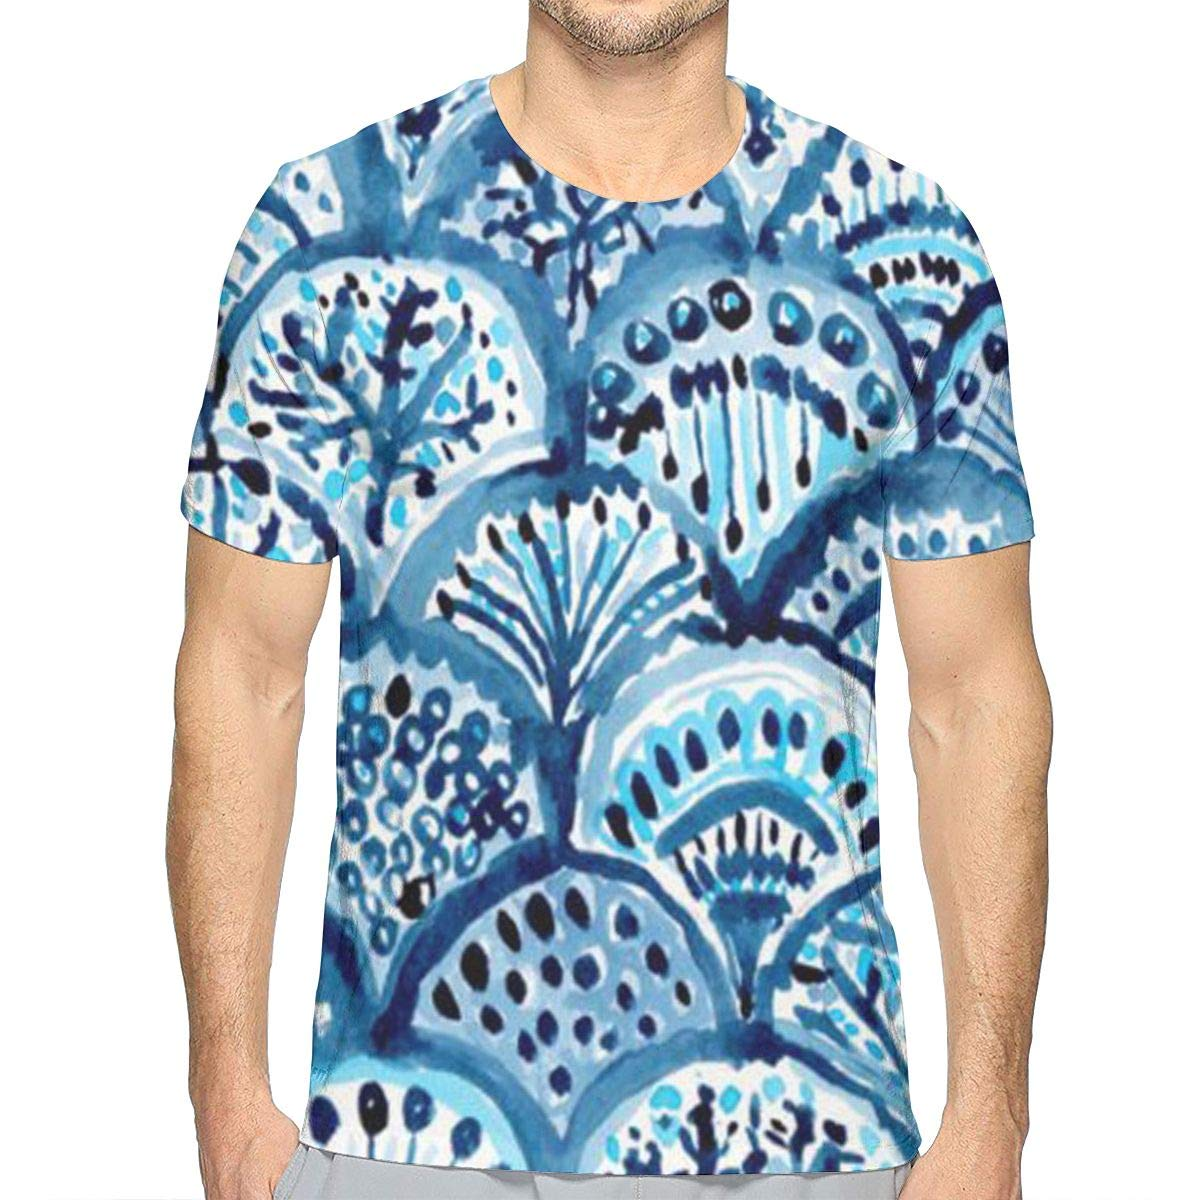 FANTASY SPACE Hip Pop Short Sleeve T-Shirts Top Tees for Men Boys Teens Adult, Regular Sizes